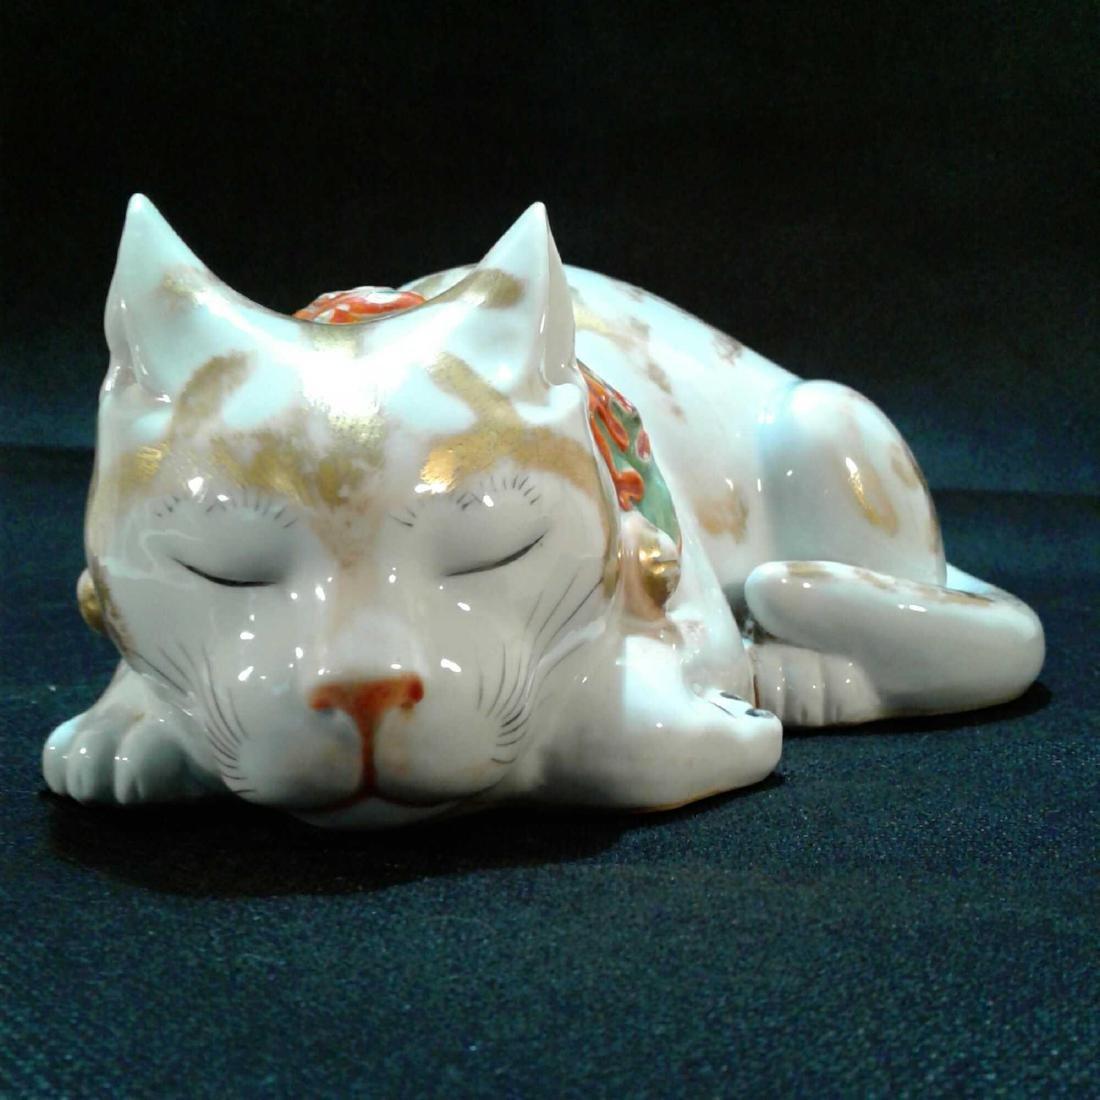 Japanese Kutani Sleeping Cat Porcelain Figure - 5